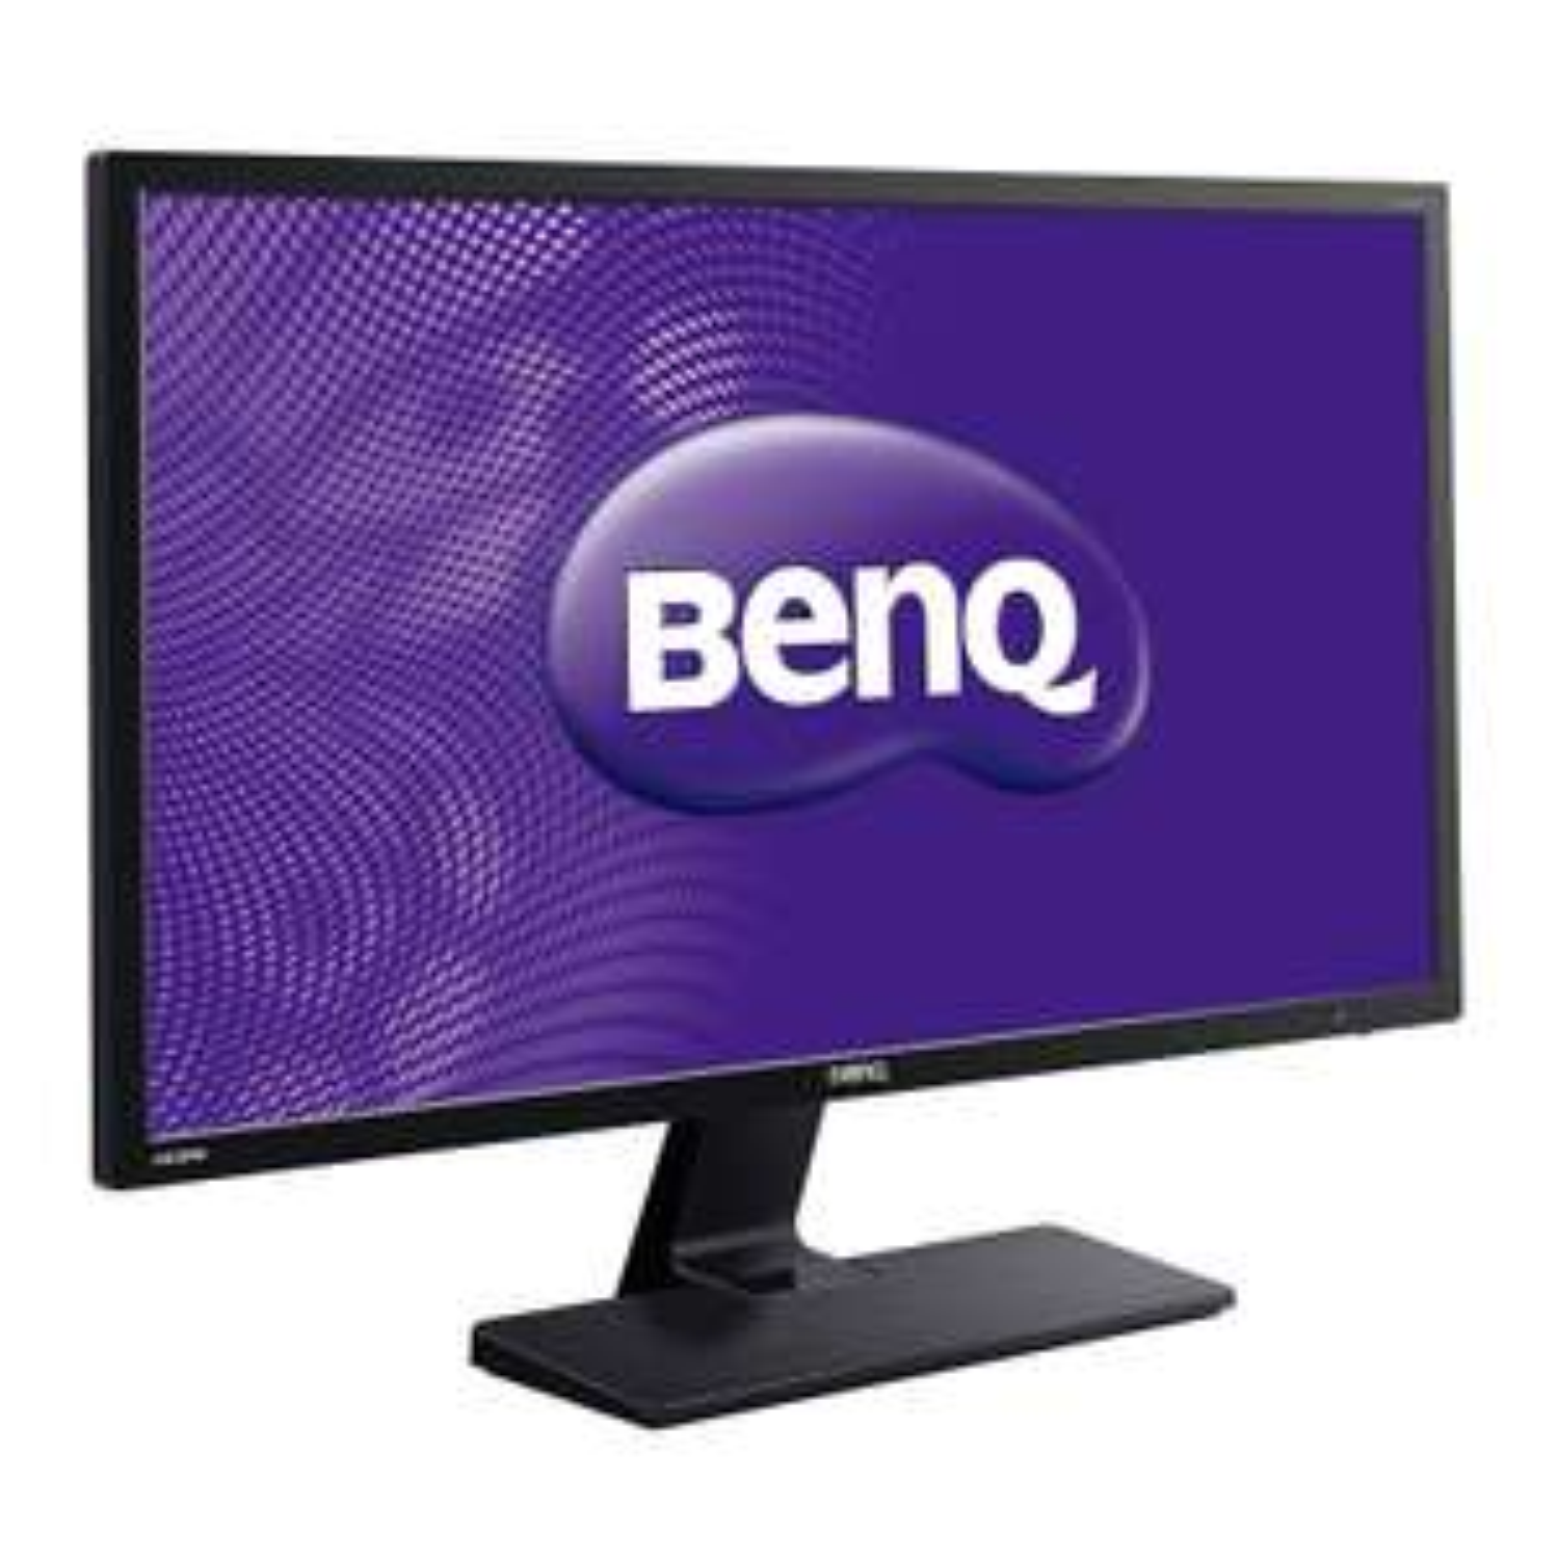 BenQ GC2870H Monitor/Bildschirm Full-HD (28 Zoll / 16:9), LED, VA-Panel, 2x HDMI